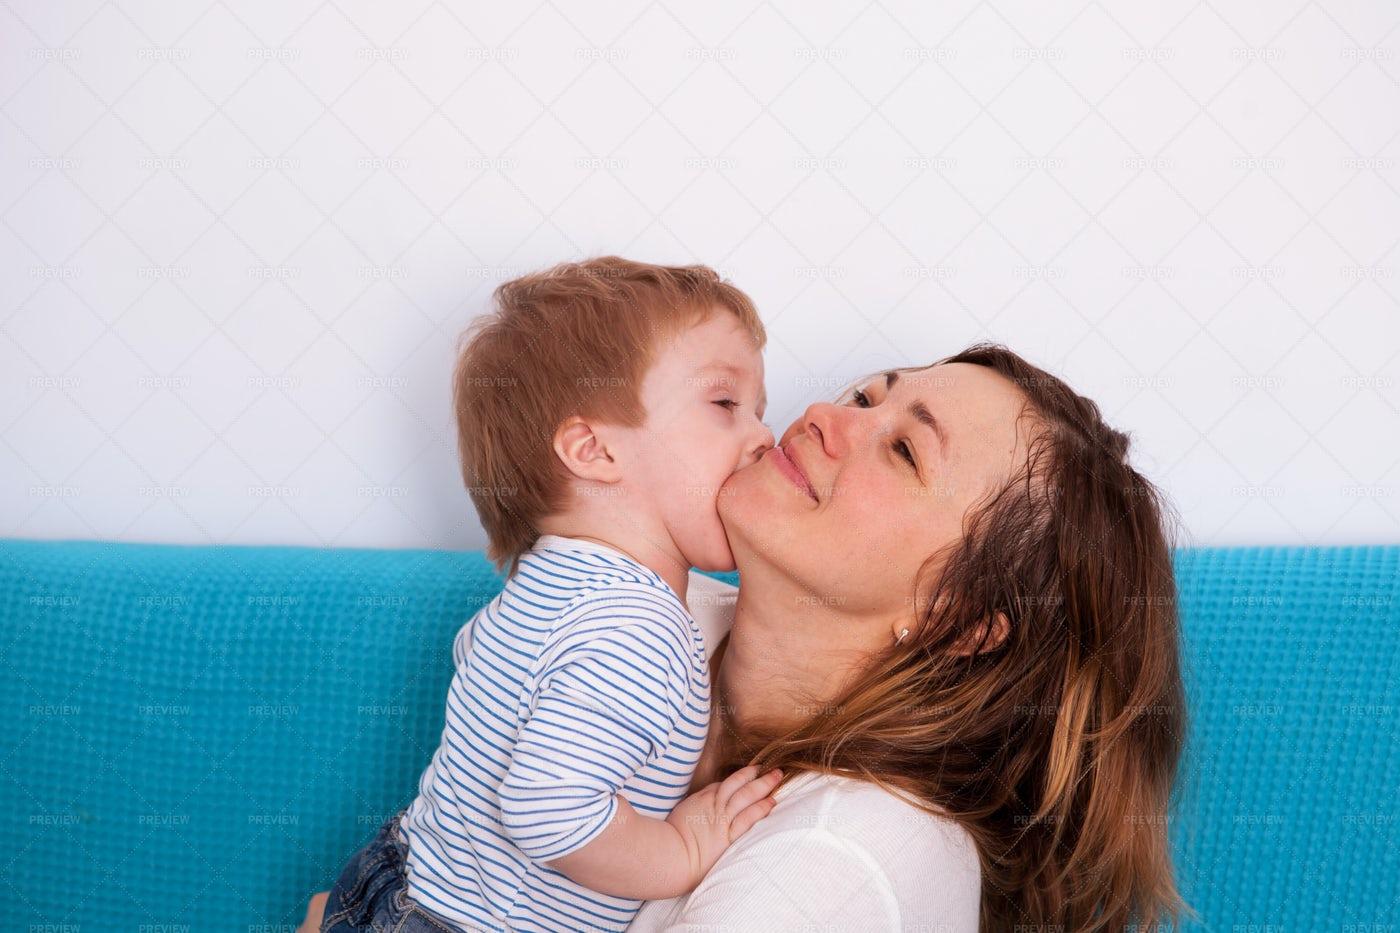 Giving Mom Cheek Kisses: Stock Photos